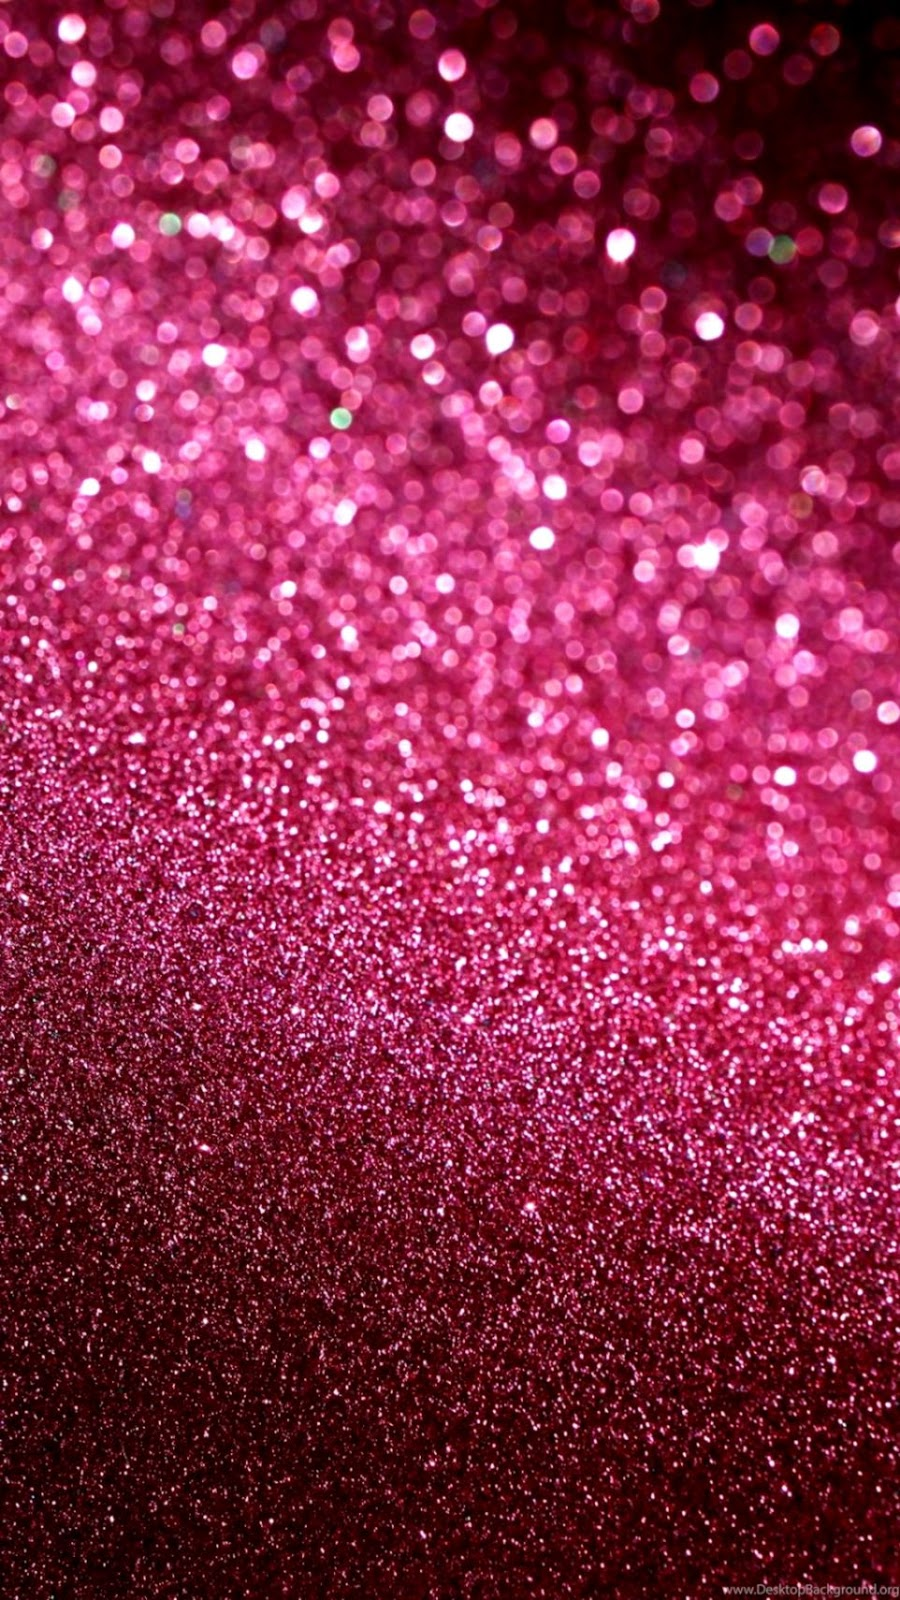 Iphone 6 Pink Wallpaper Wallpapers Image